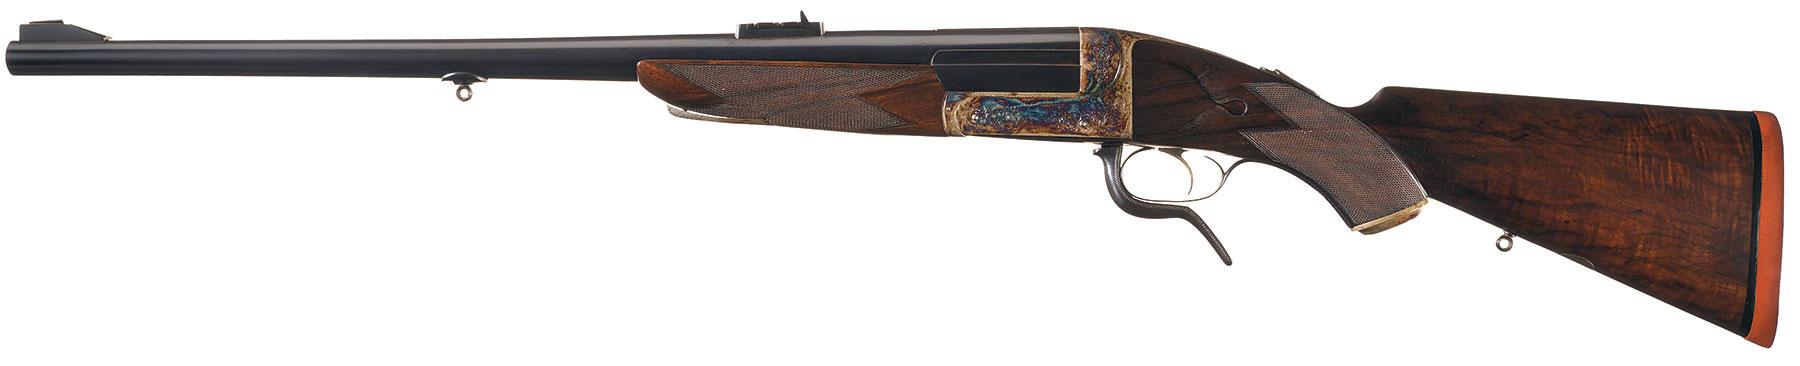 Jeffery .600 Nitro Express single shot Anson & Deeley under-lever